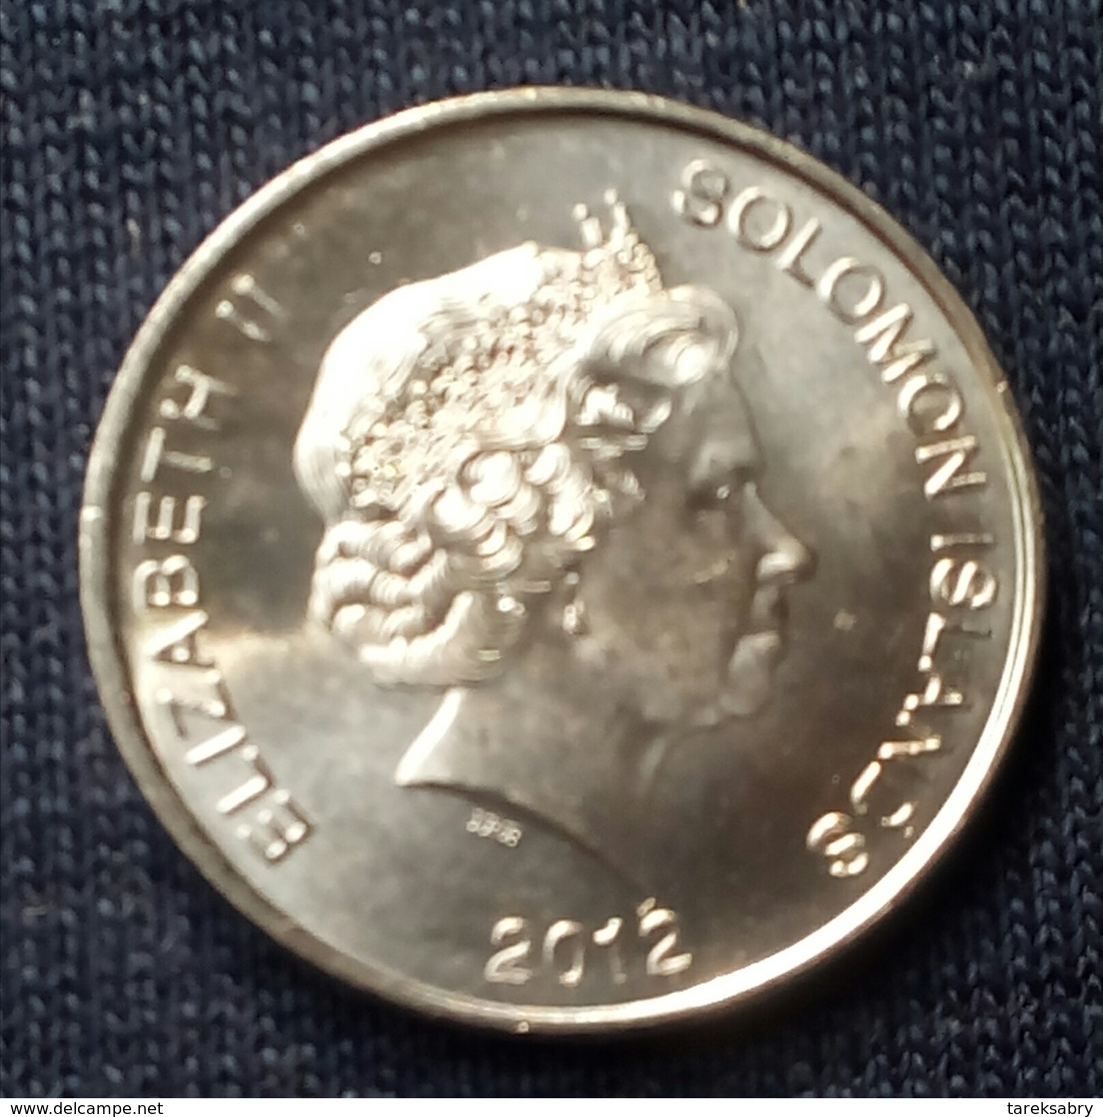 Salomon - Elisabeth II, 10 Cents - 2012 - KM 235 - Agouz - Salomonen